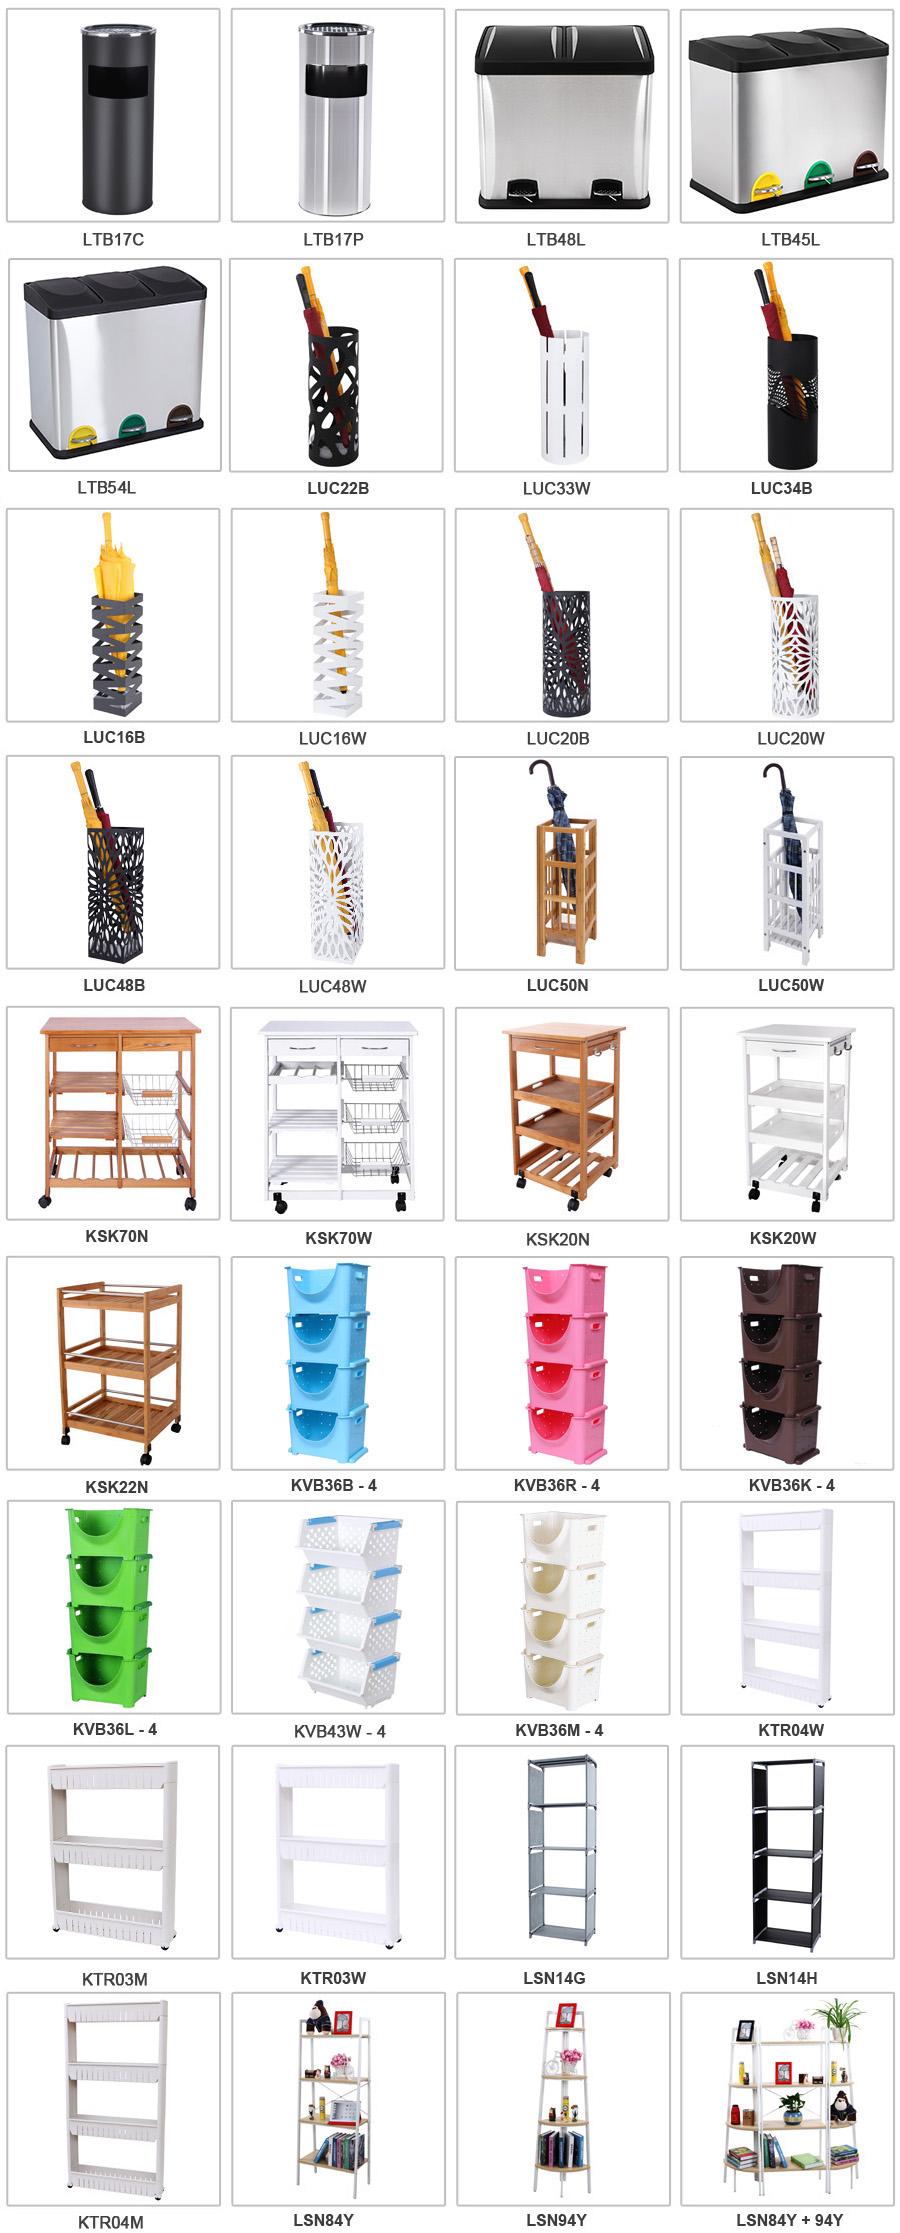 songmics kitchen trolley dining cart storage drawers shelves metal baskets ksk